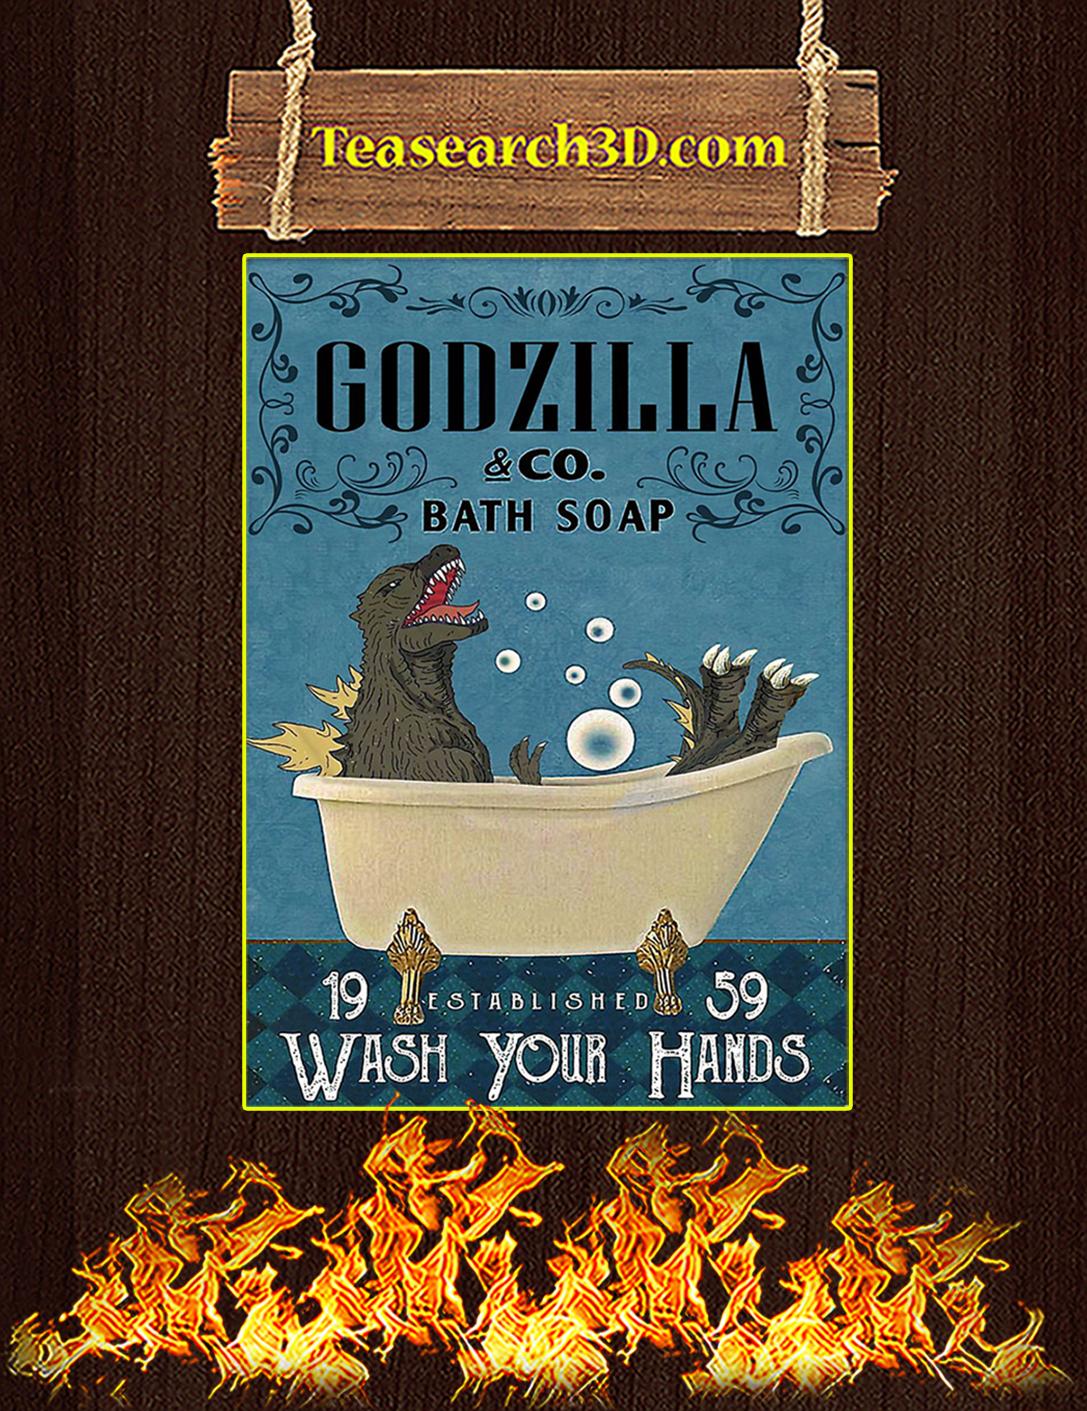 Godzilla co bath soap wash your hands poster A2